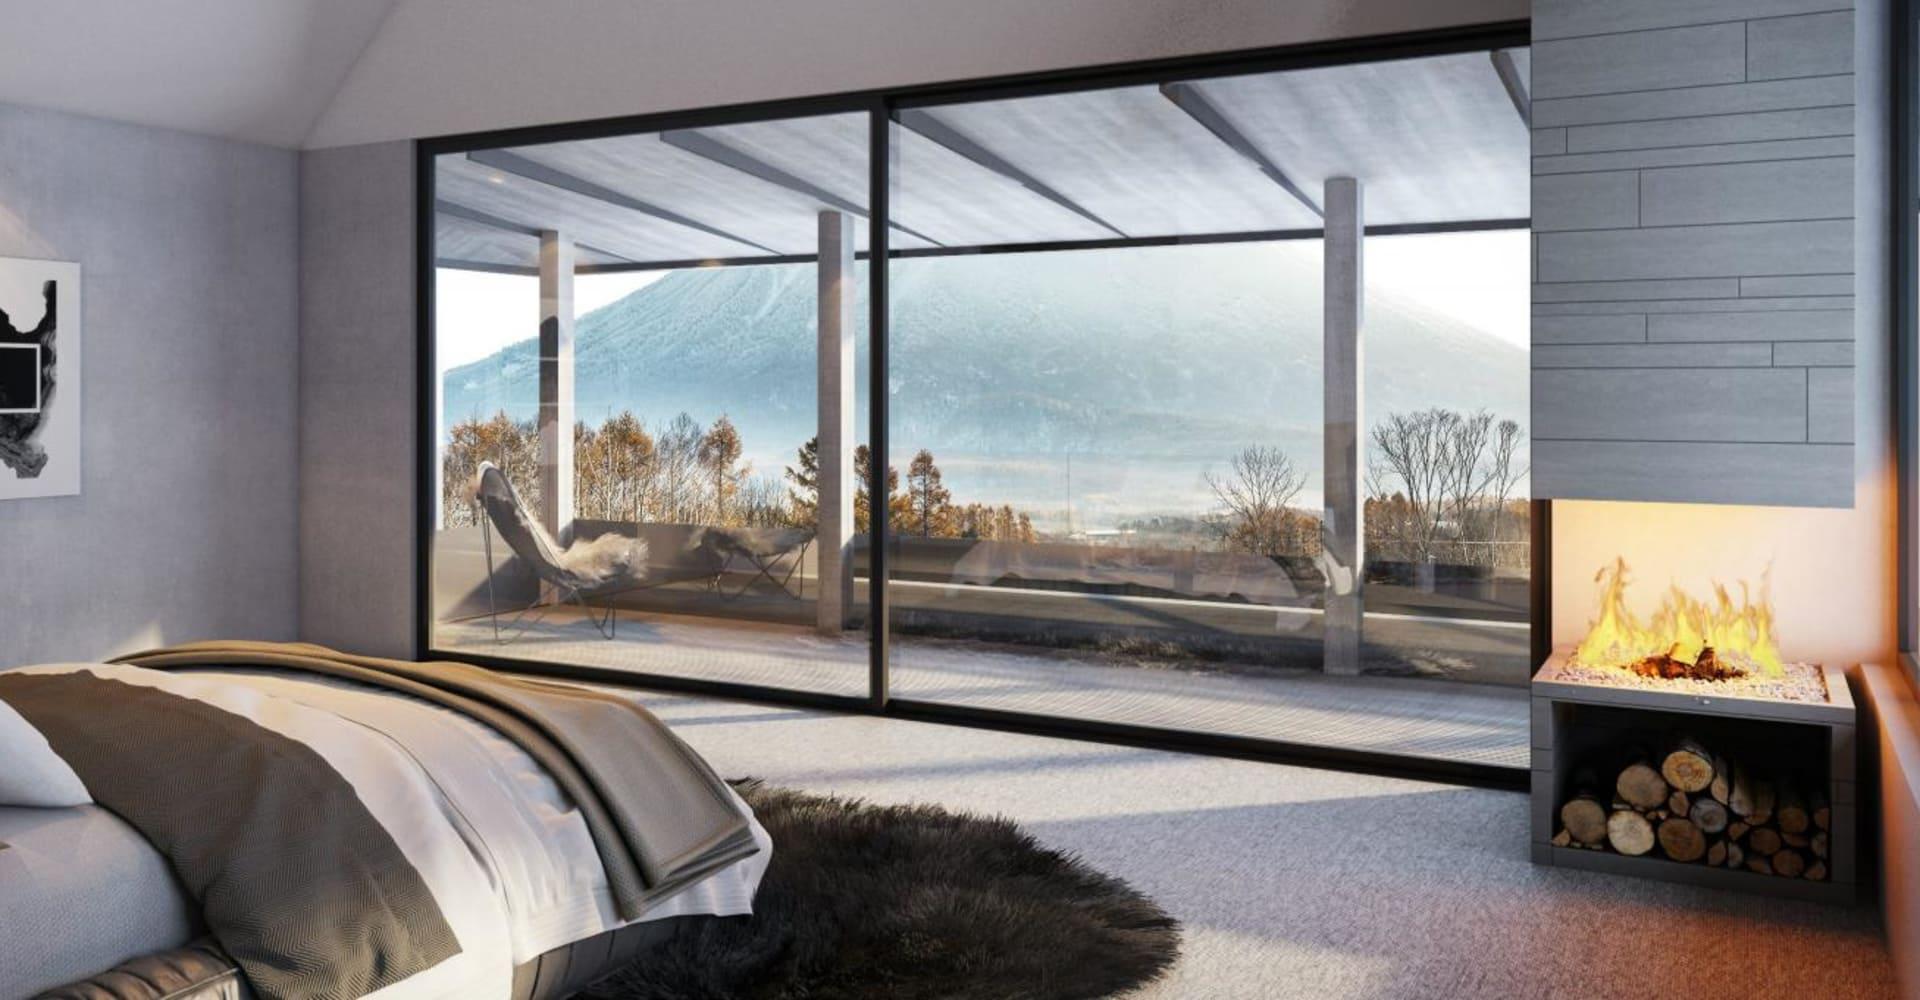 Design & Interior - The Pavilions Ginto